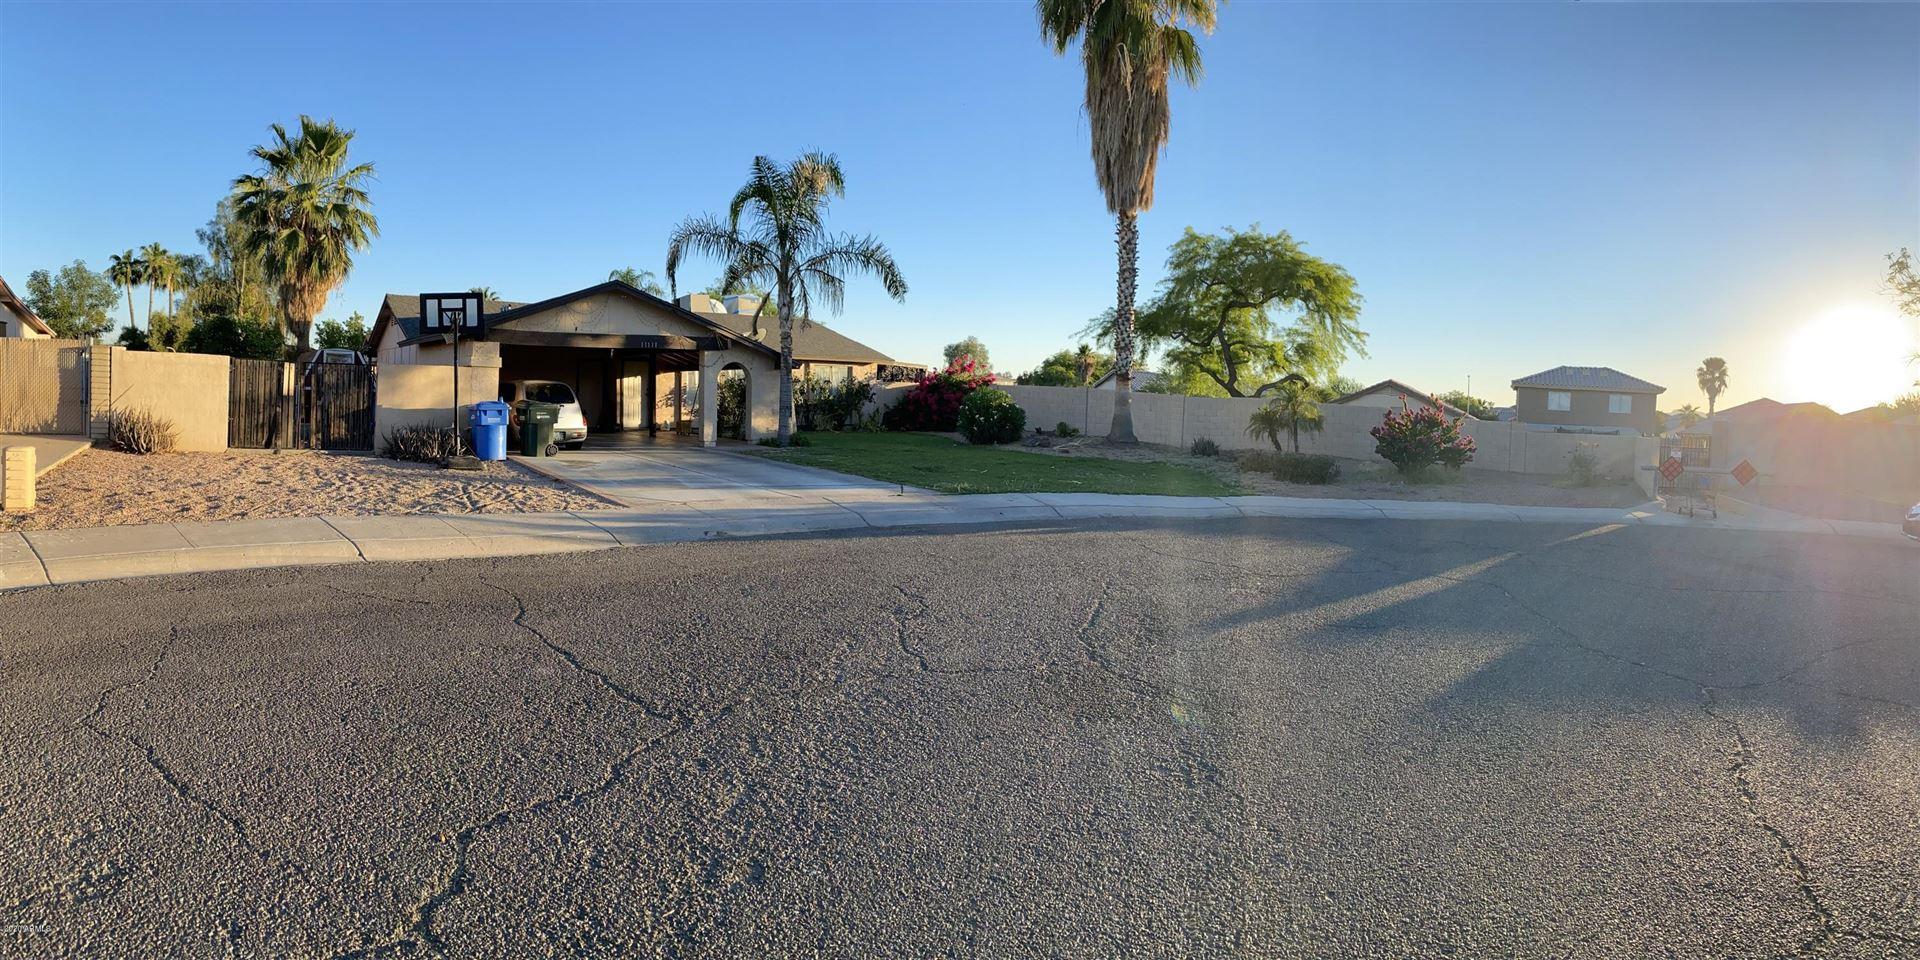 Property Image Of 11111 W Calle Del Sol Street In Phoenix, Az